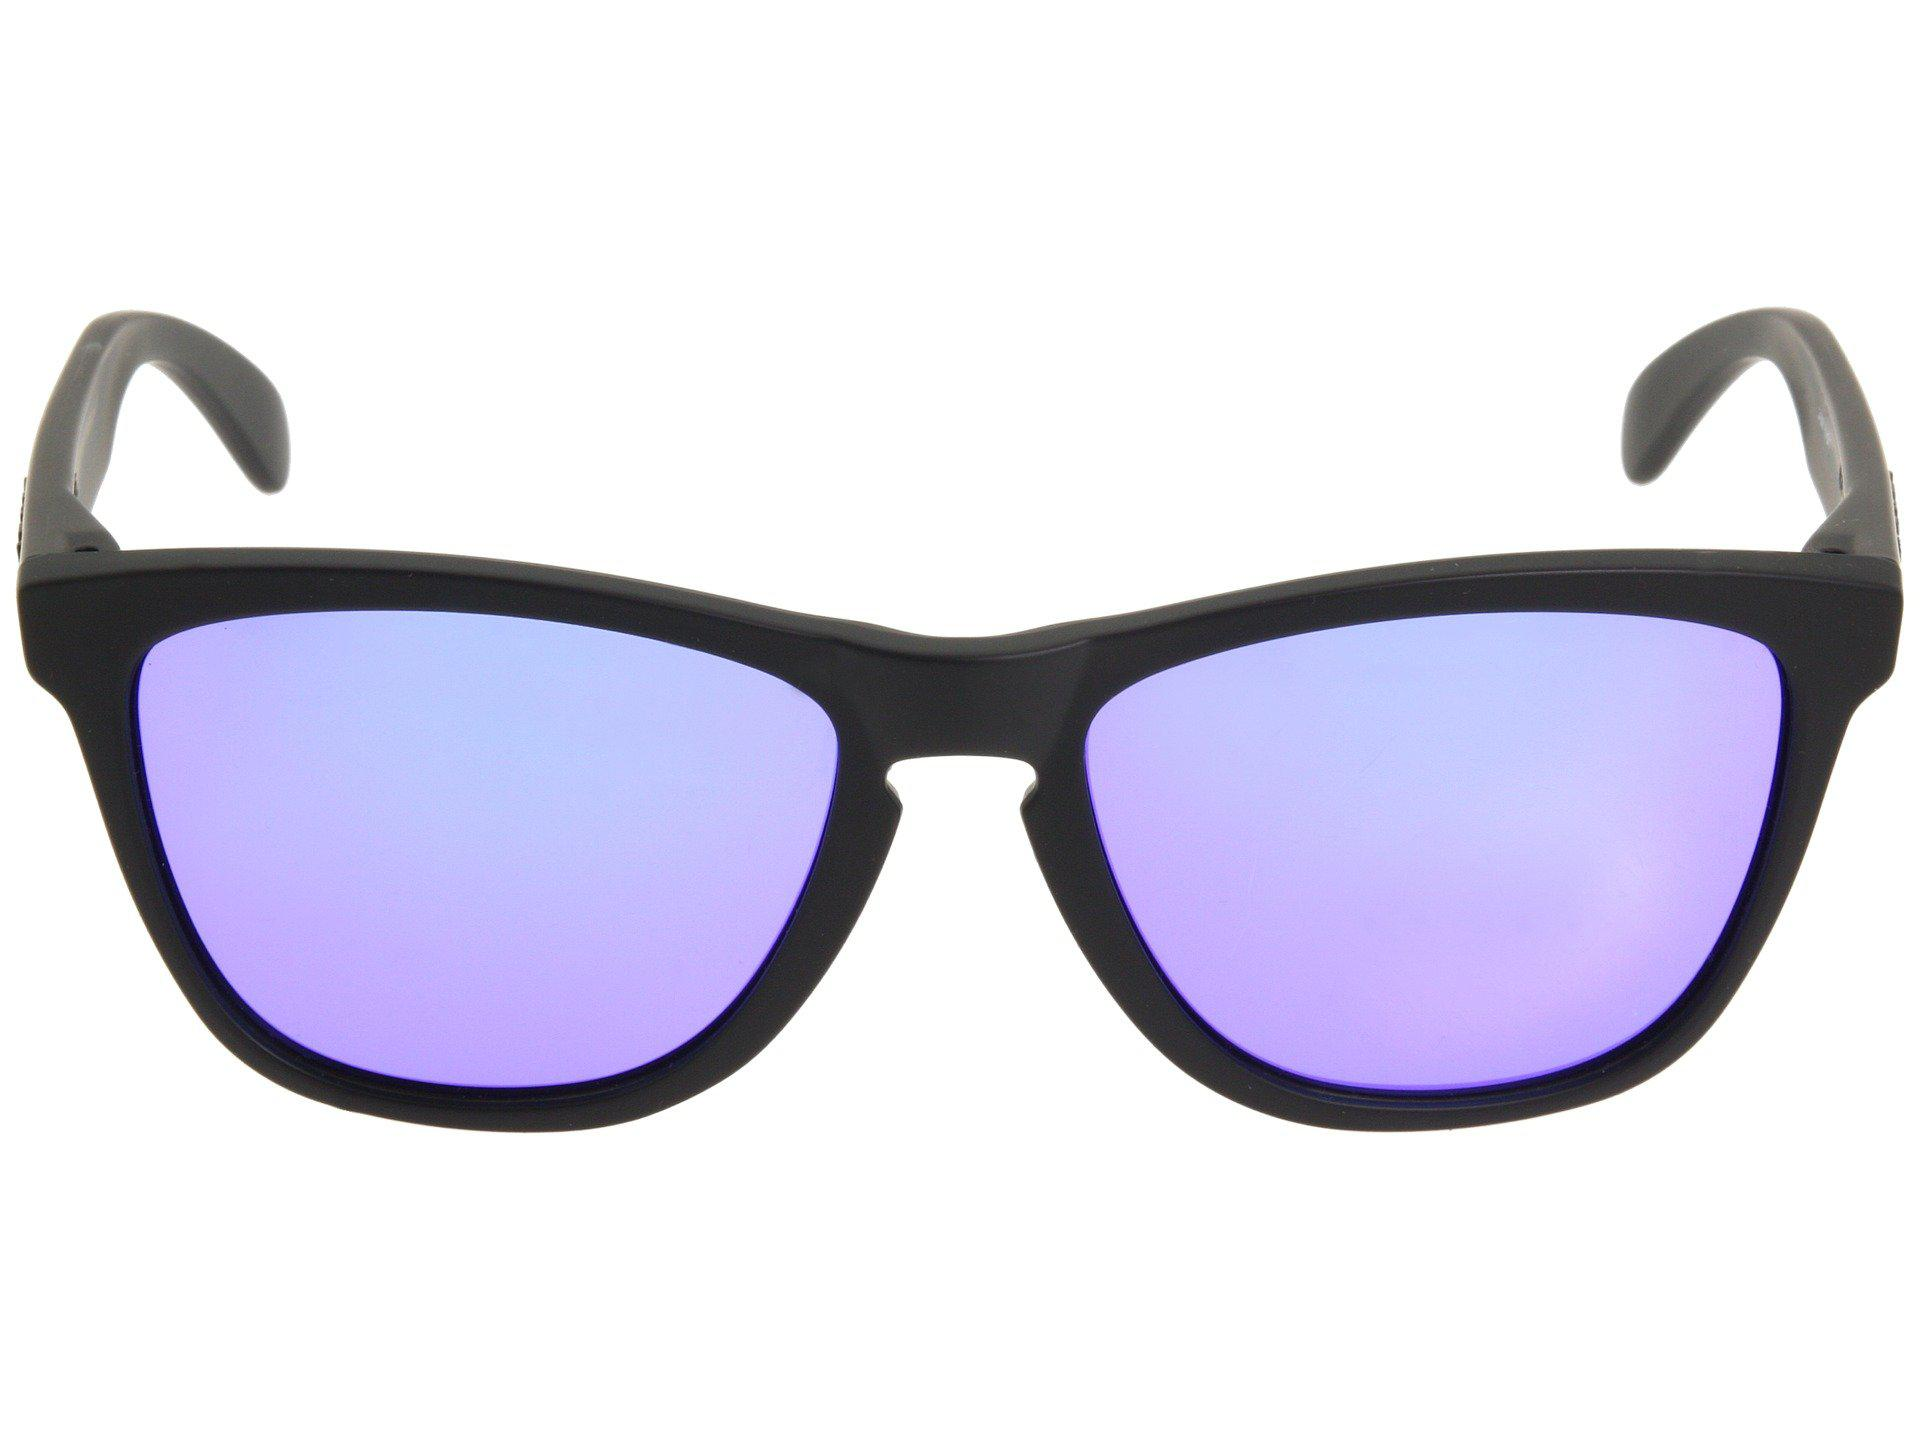 Oakley - Frogskins(r) (matte Black violet Iridium Lens) Sport Sunglasses.  View fullscreen e75c1fe509